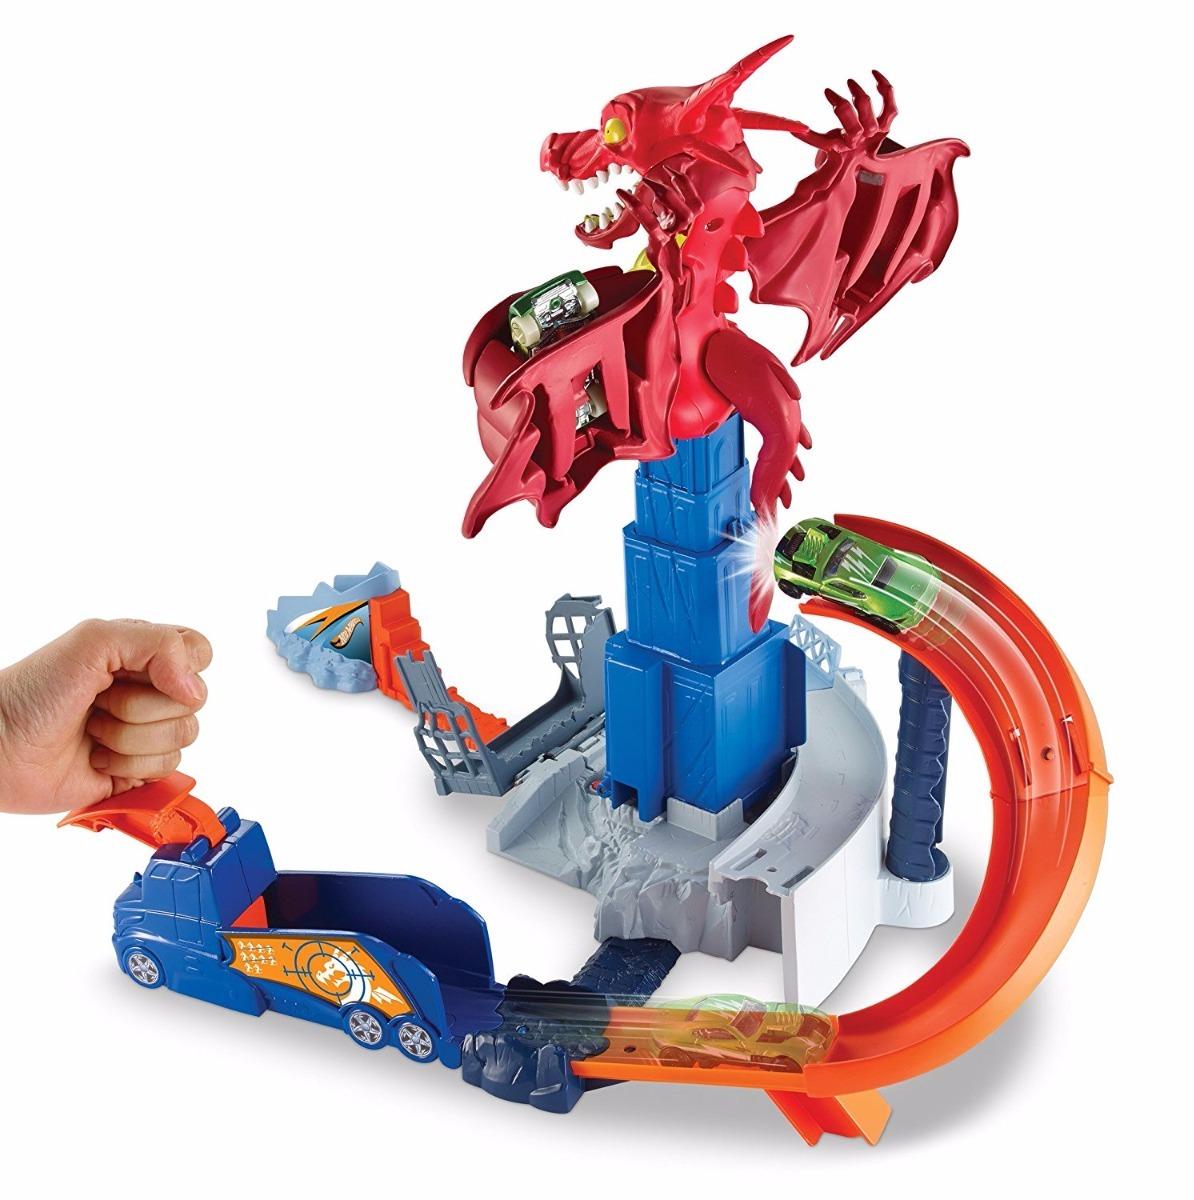 Hot Wheels Juego Creativo Dragon Attack Pista De Carros S 160 00